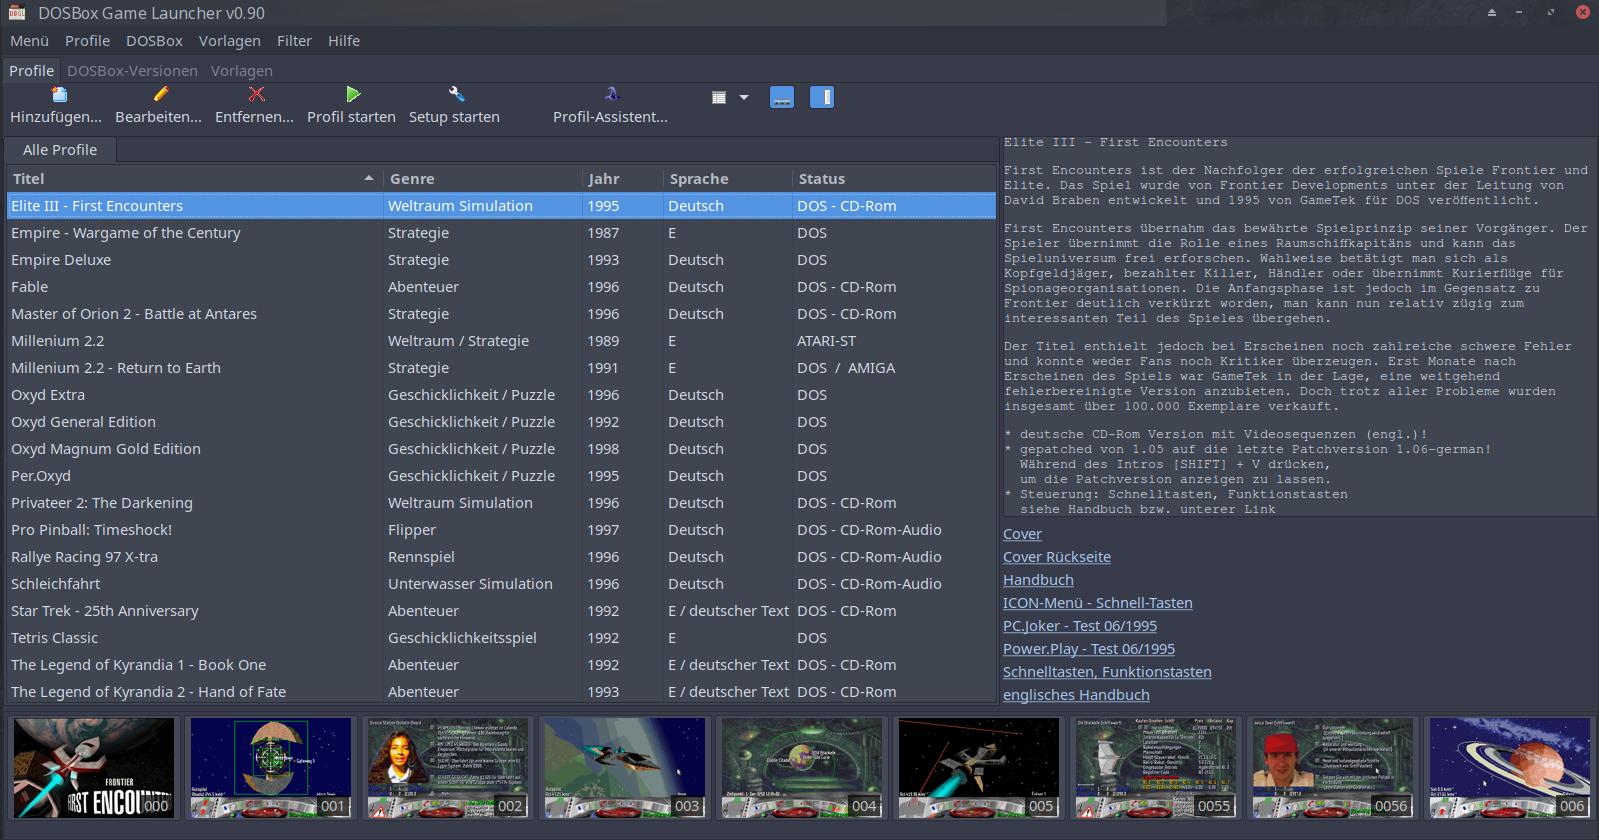 DOSBox Game Launcher